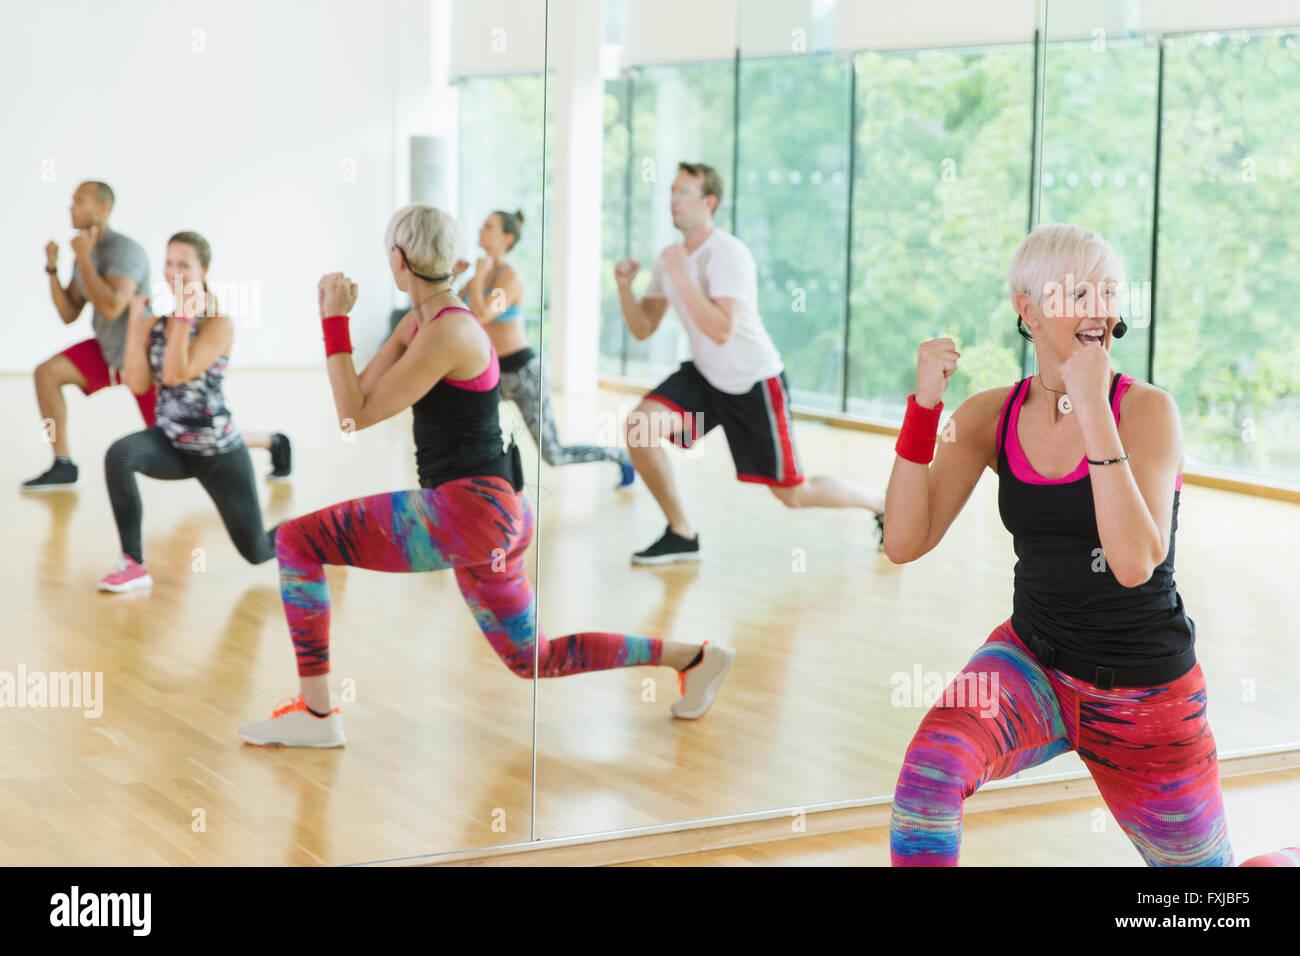 Fitness instructor leading aerobics class Stock Photo